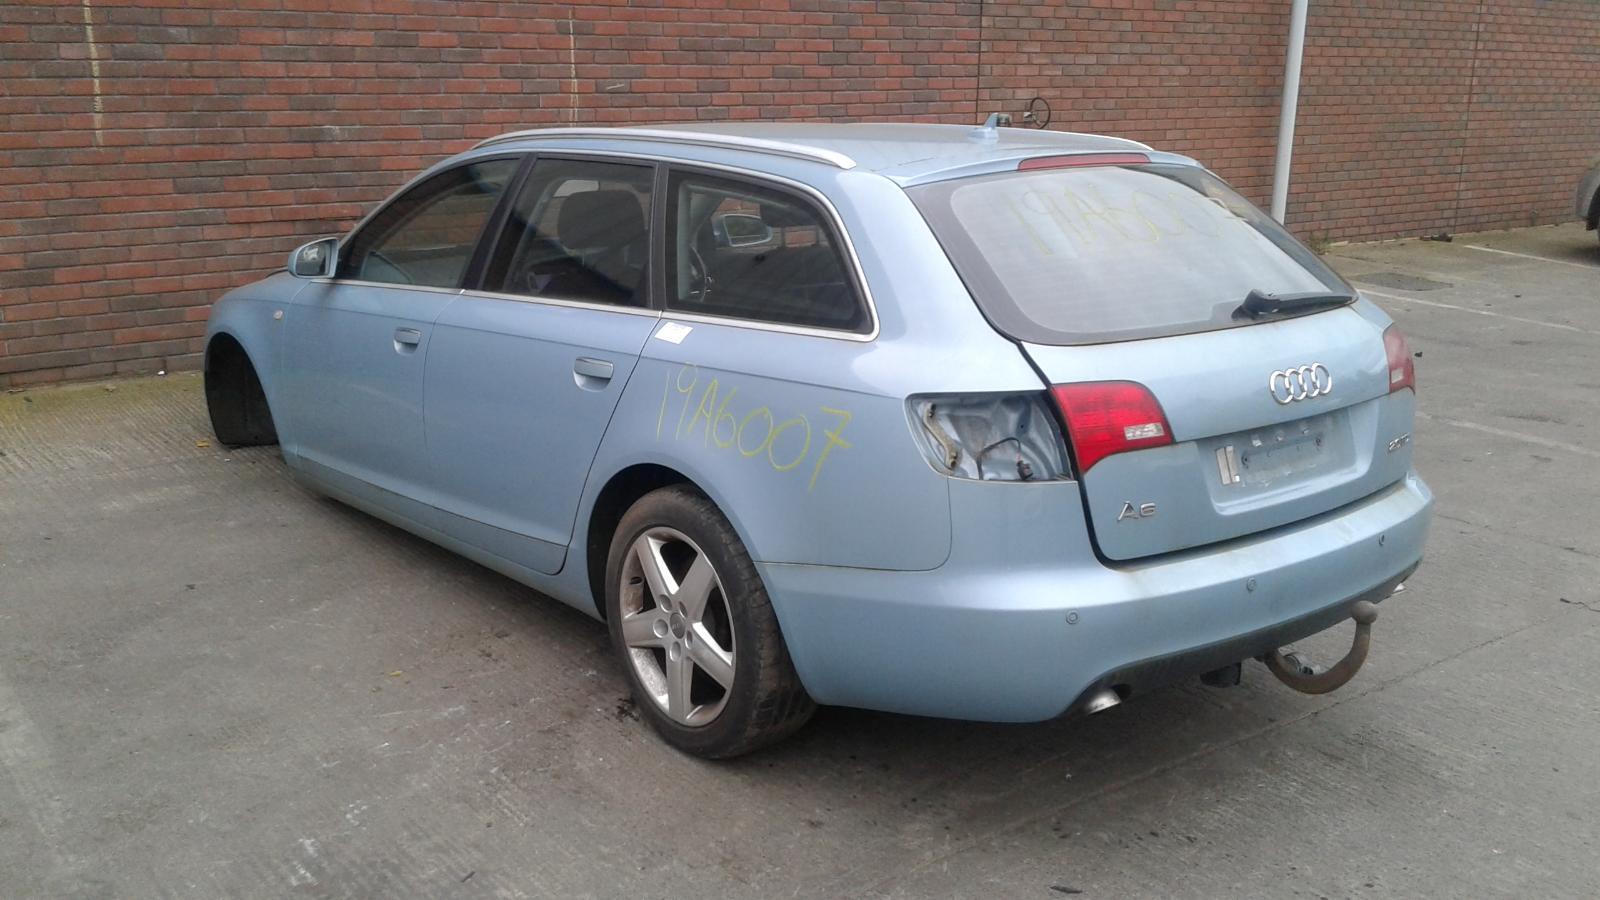 2006 AUDI A6 Image